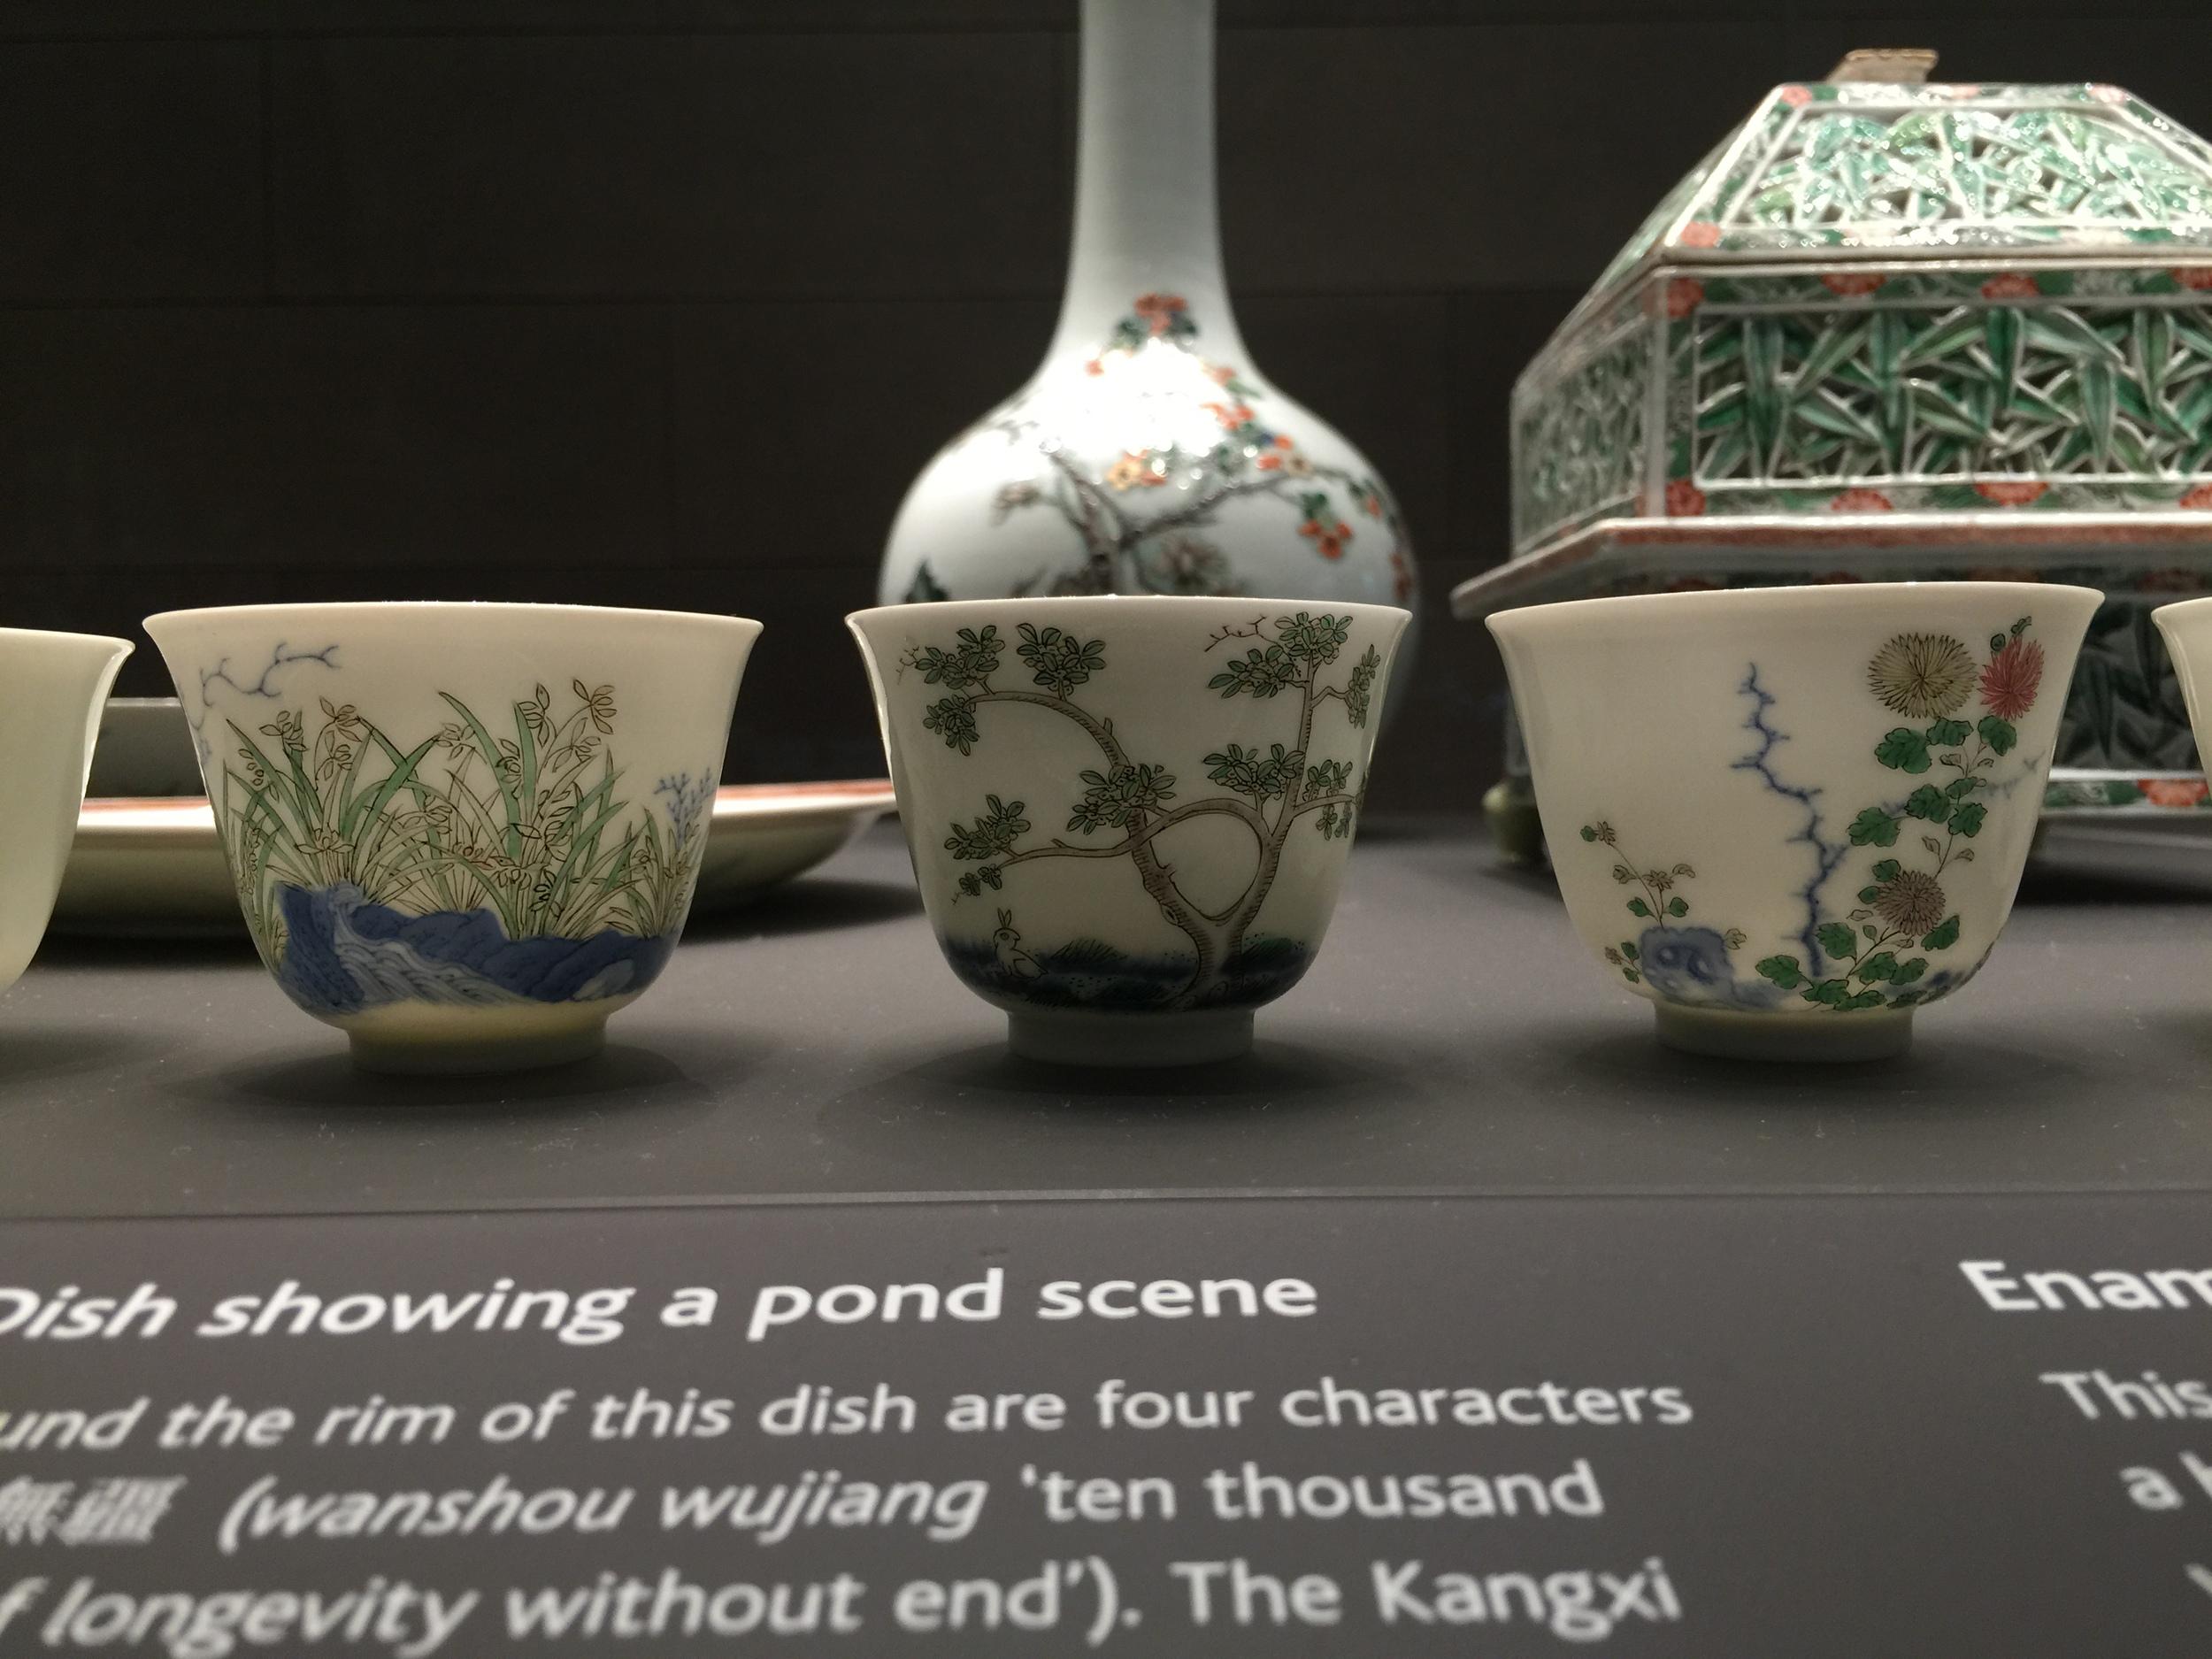 Chinese-Porcelain-British-Museum-Percival-David-jessewaugh.com-129.jpg